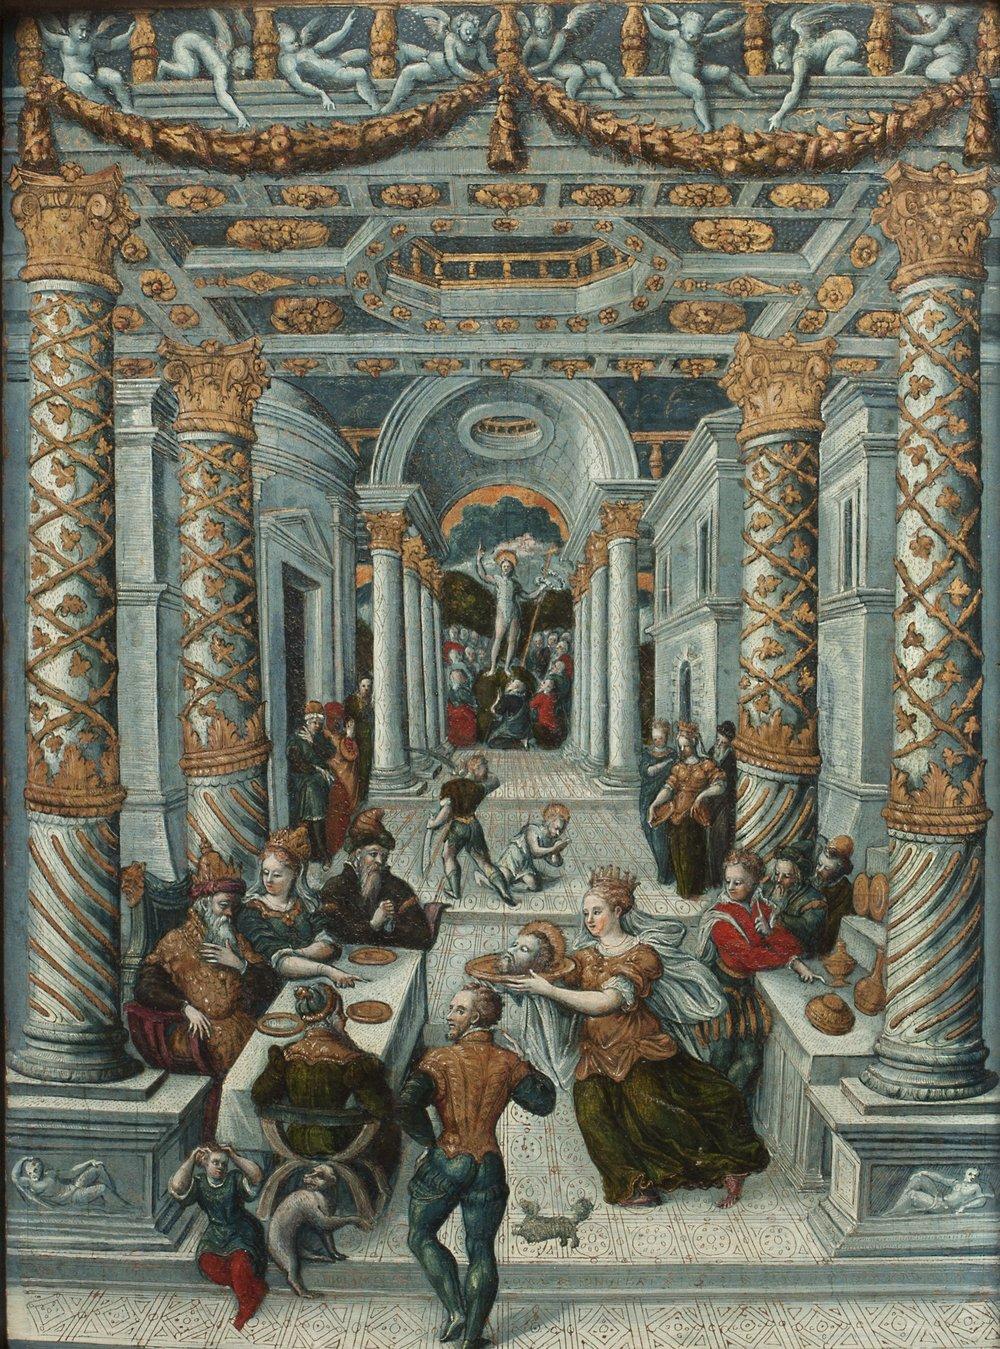 GIROLAMO COMI Scenes from the Life of St. John the Baptist